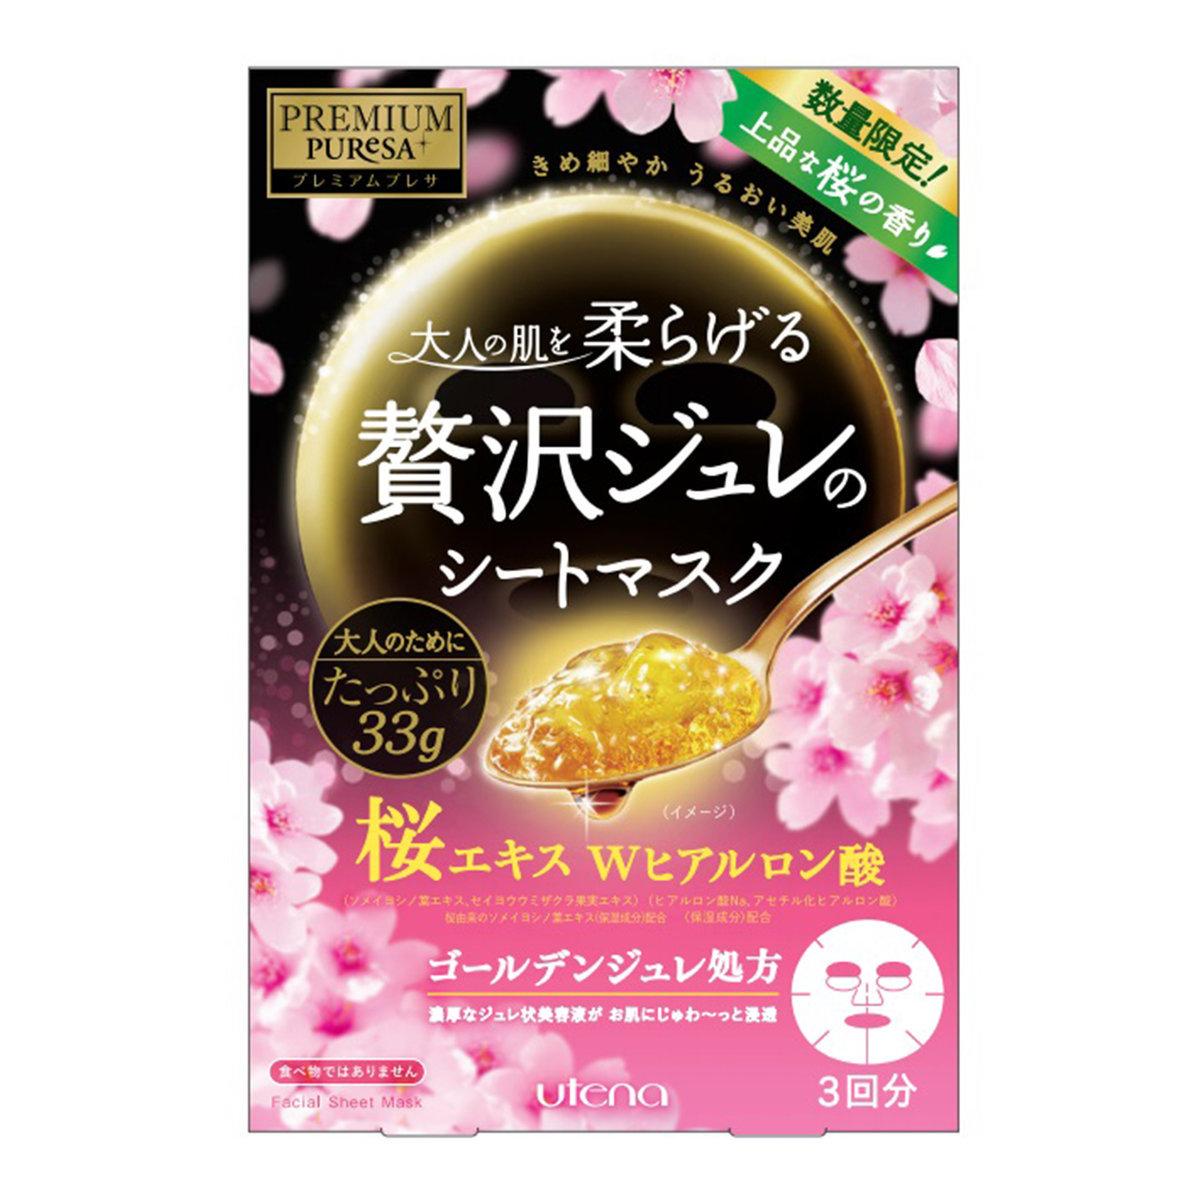 Utena Premium Puresa 佑天娜 櫻花限定黃金o者哩面膜 (1盒3片) 33g 粉花盒